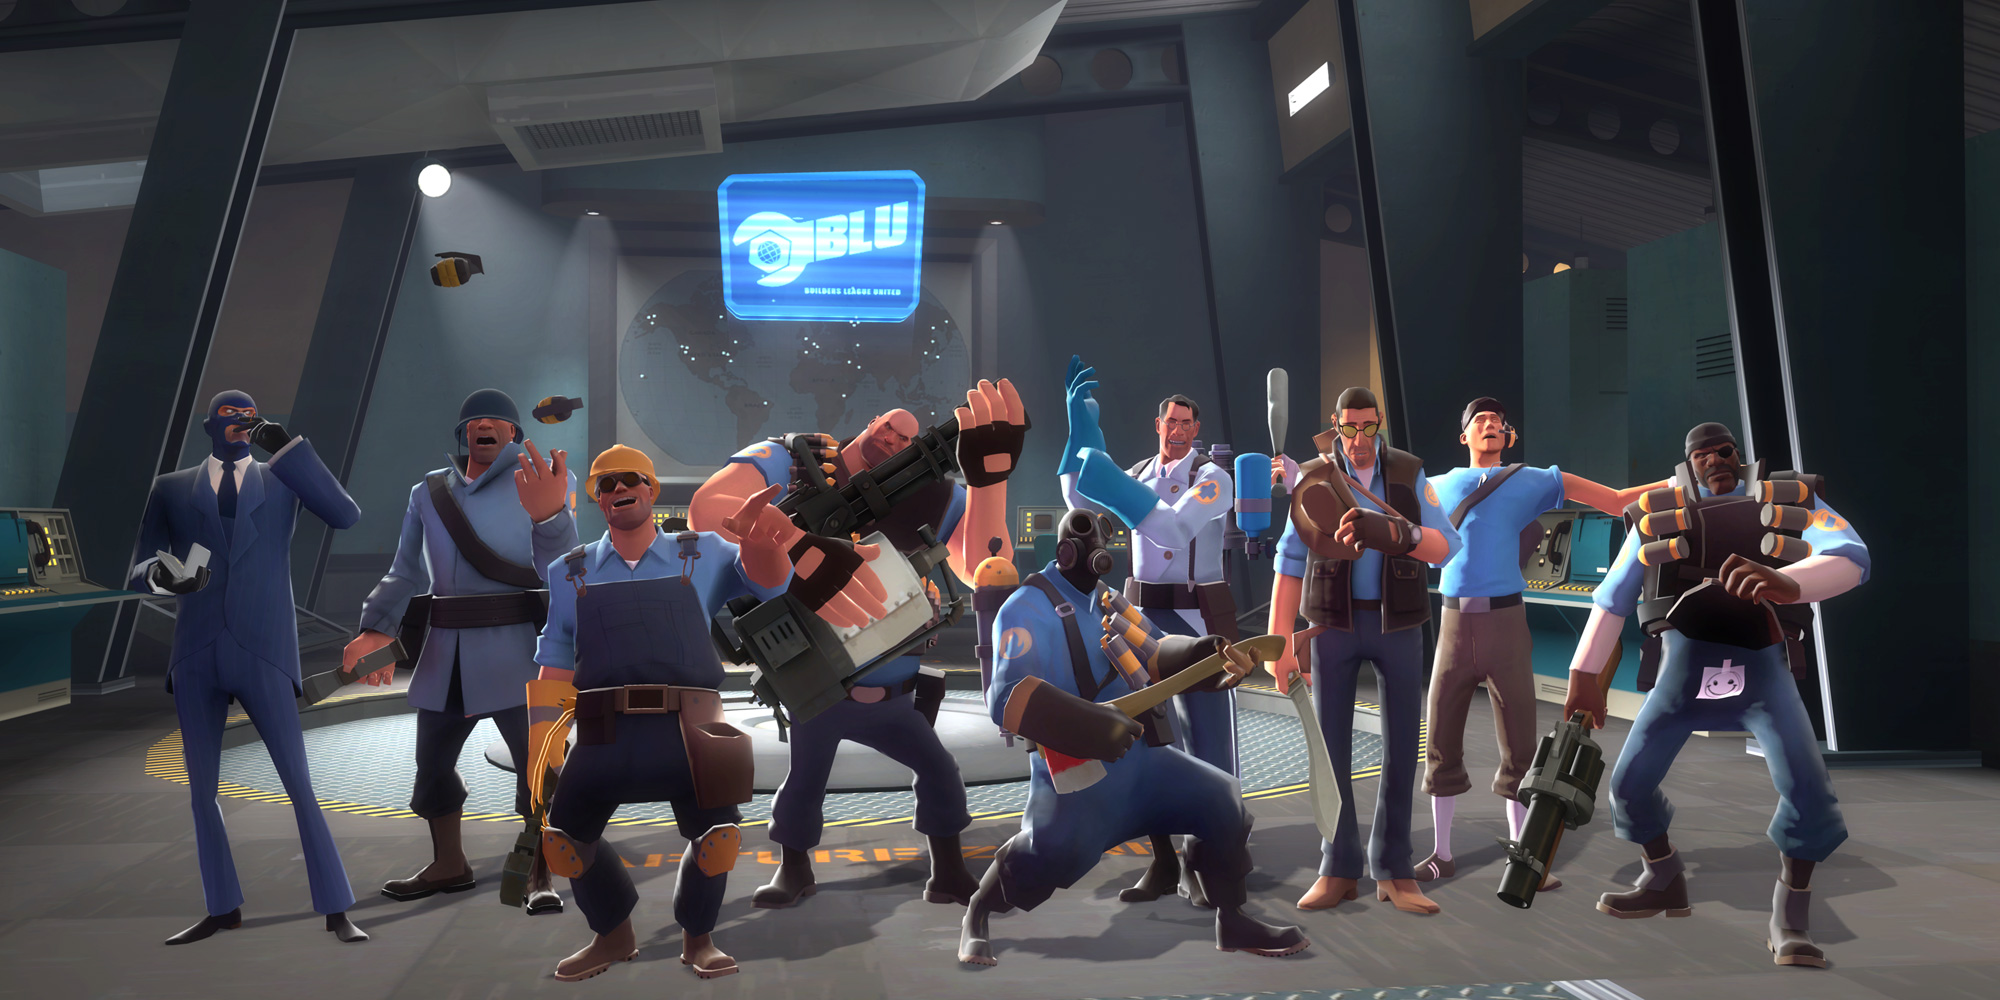 Team Fortress 2 Group Wallpaper 2000 x 1000 Press Start To 2000x1000